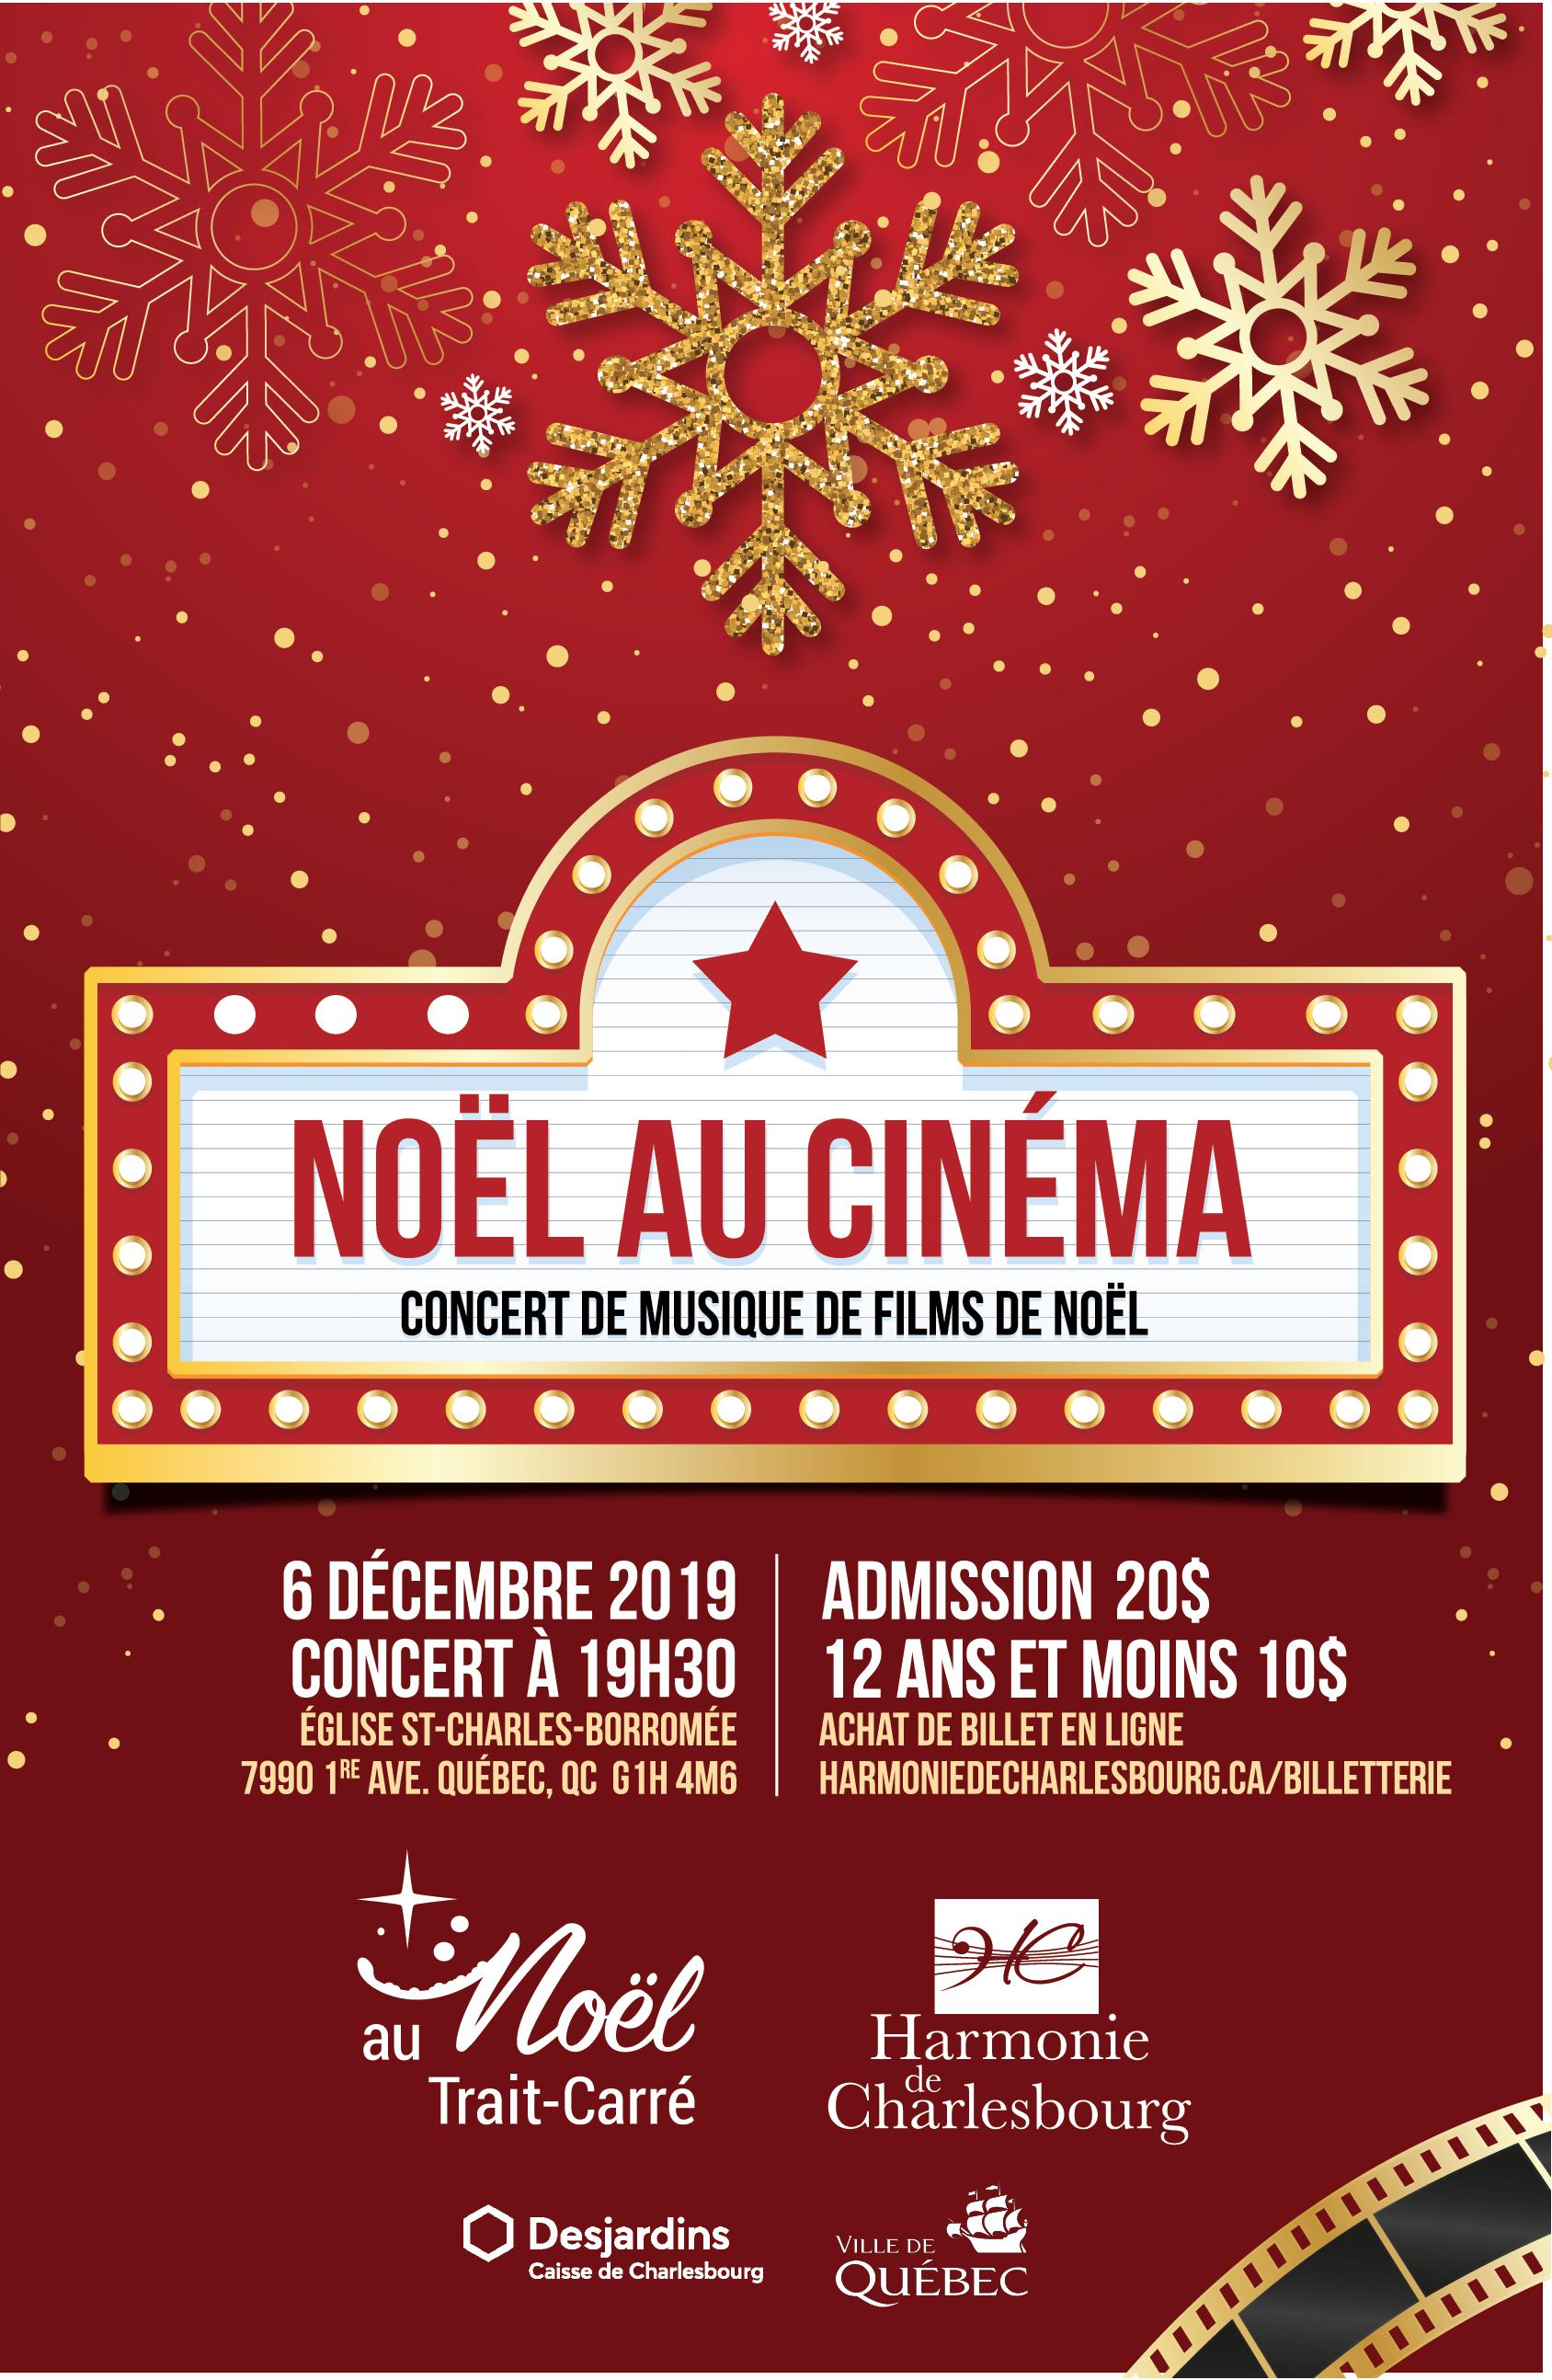 NTC-Concert-Noel-Cinema-Affiche-11x17_VF3-web